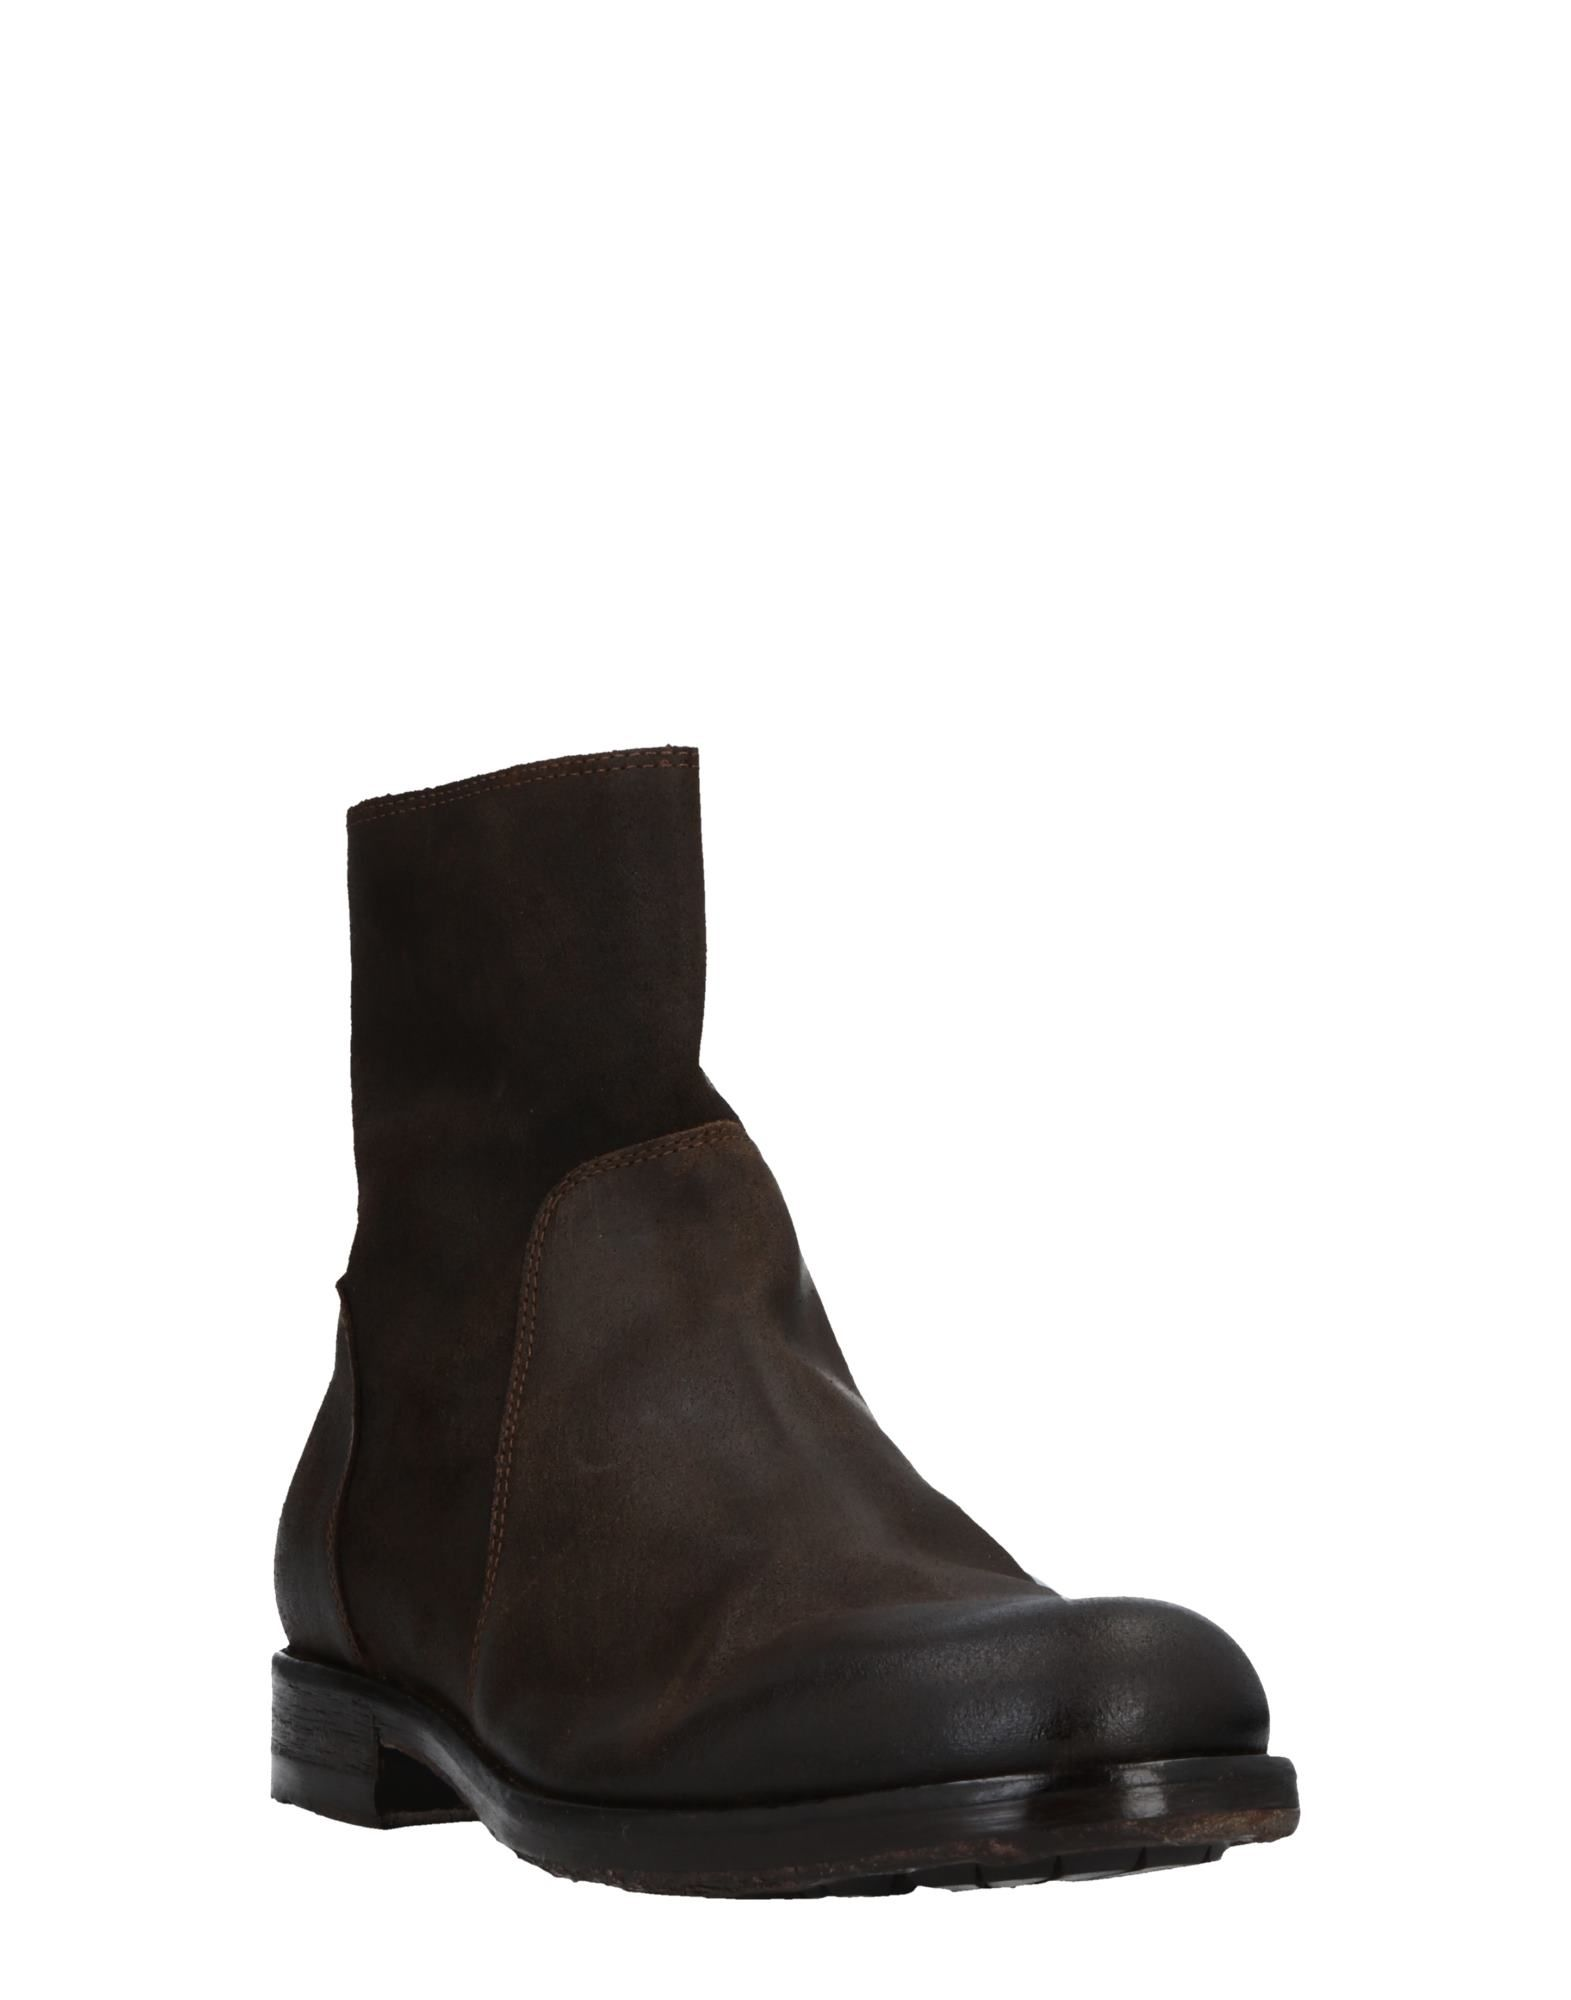 Hundred 11516616WL 100 Stiefelette Herren  11516616WL Hundred Gute Qualität beliebte Schuhe 67dbc1